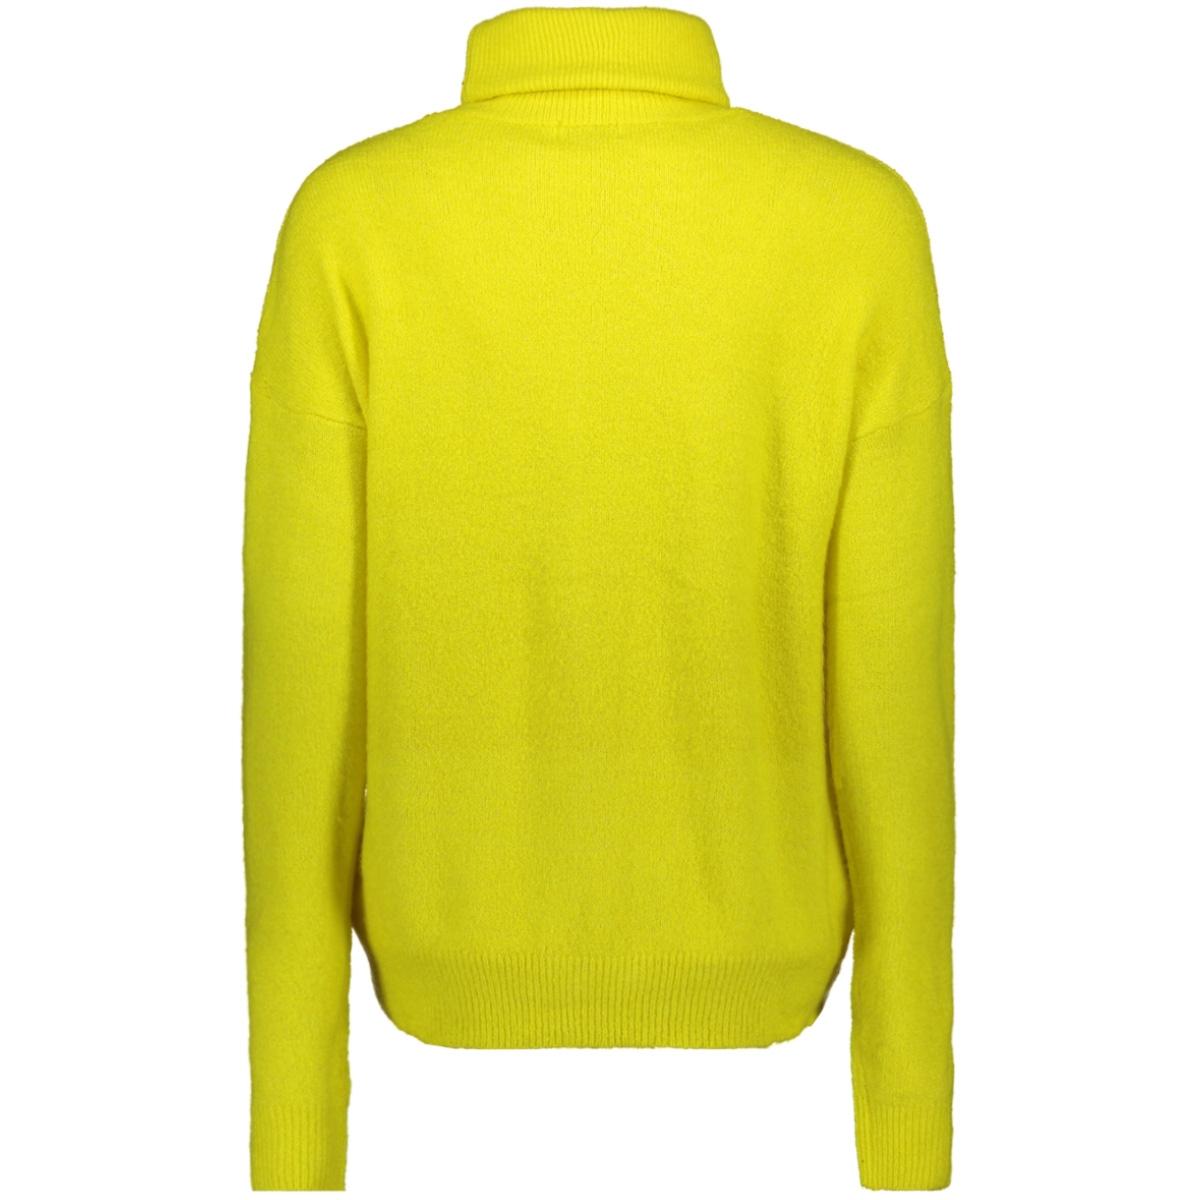 jdymia l/s neon roll neck pullover 15197152 jacqueline de yong trui neon yellow